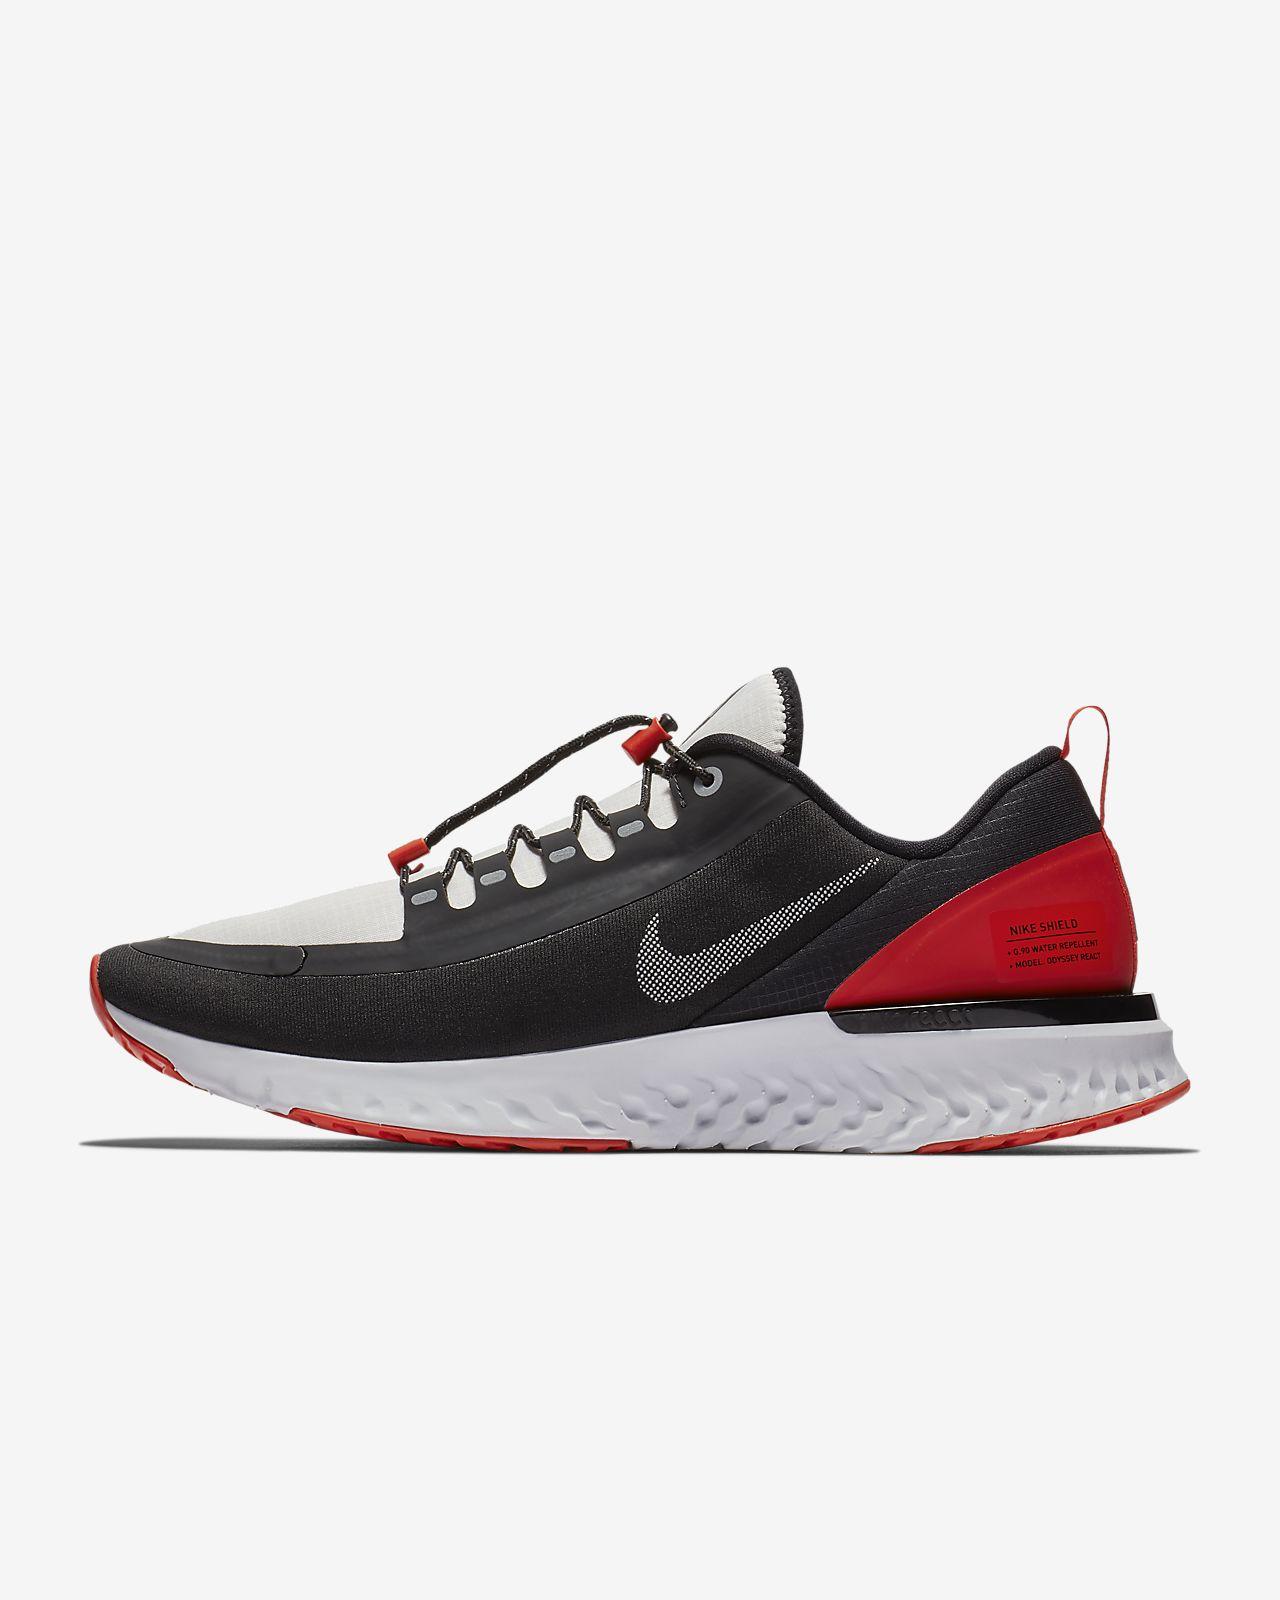 c2d6858573cf3 ... Calzado de running para hombre Nike Odyssey React Shield Water-Repellent